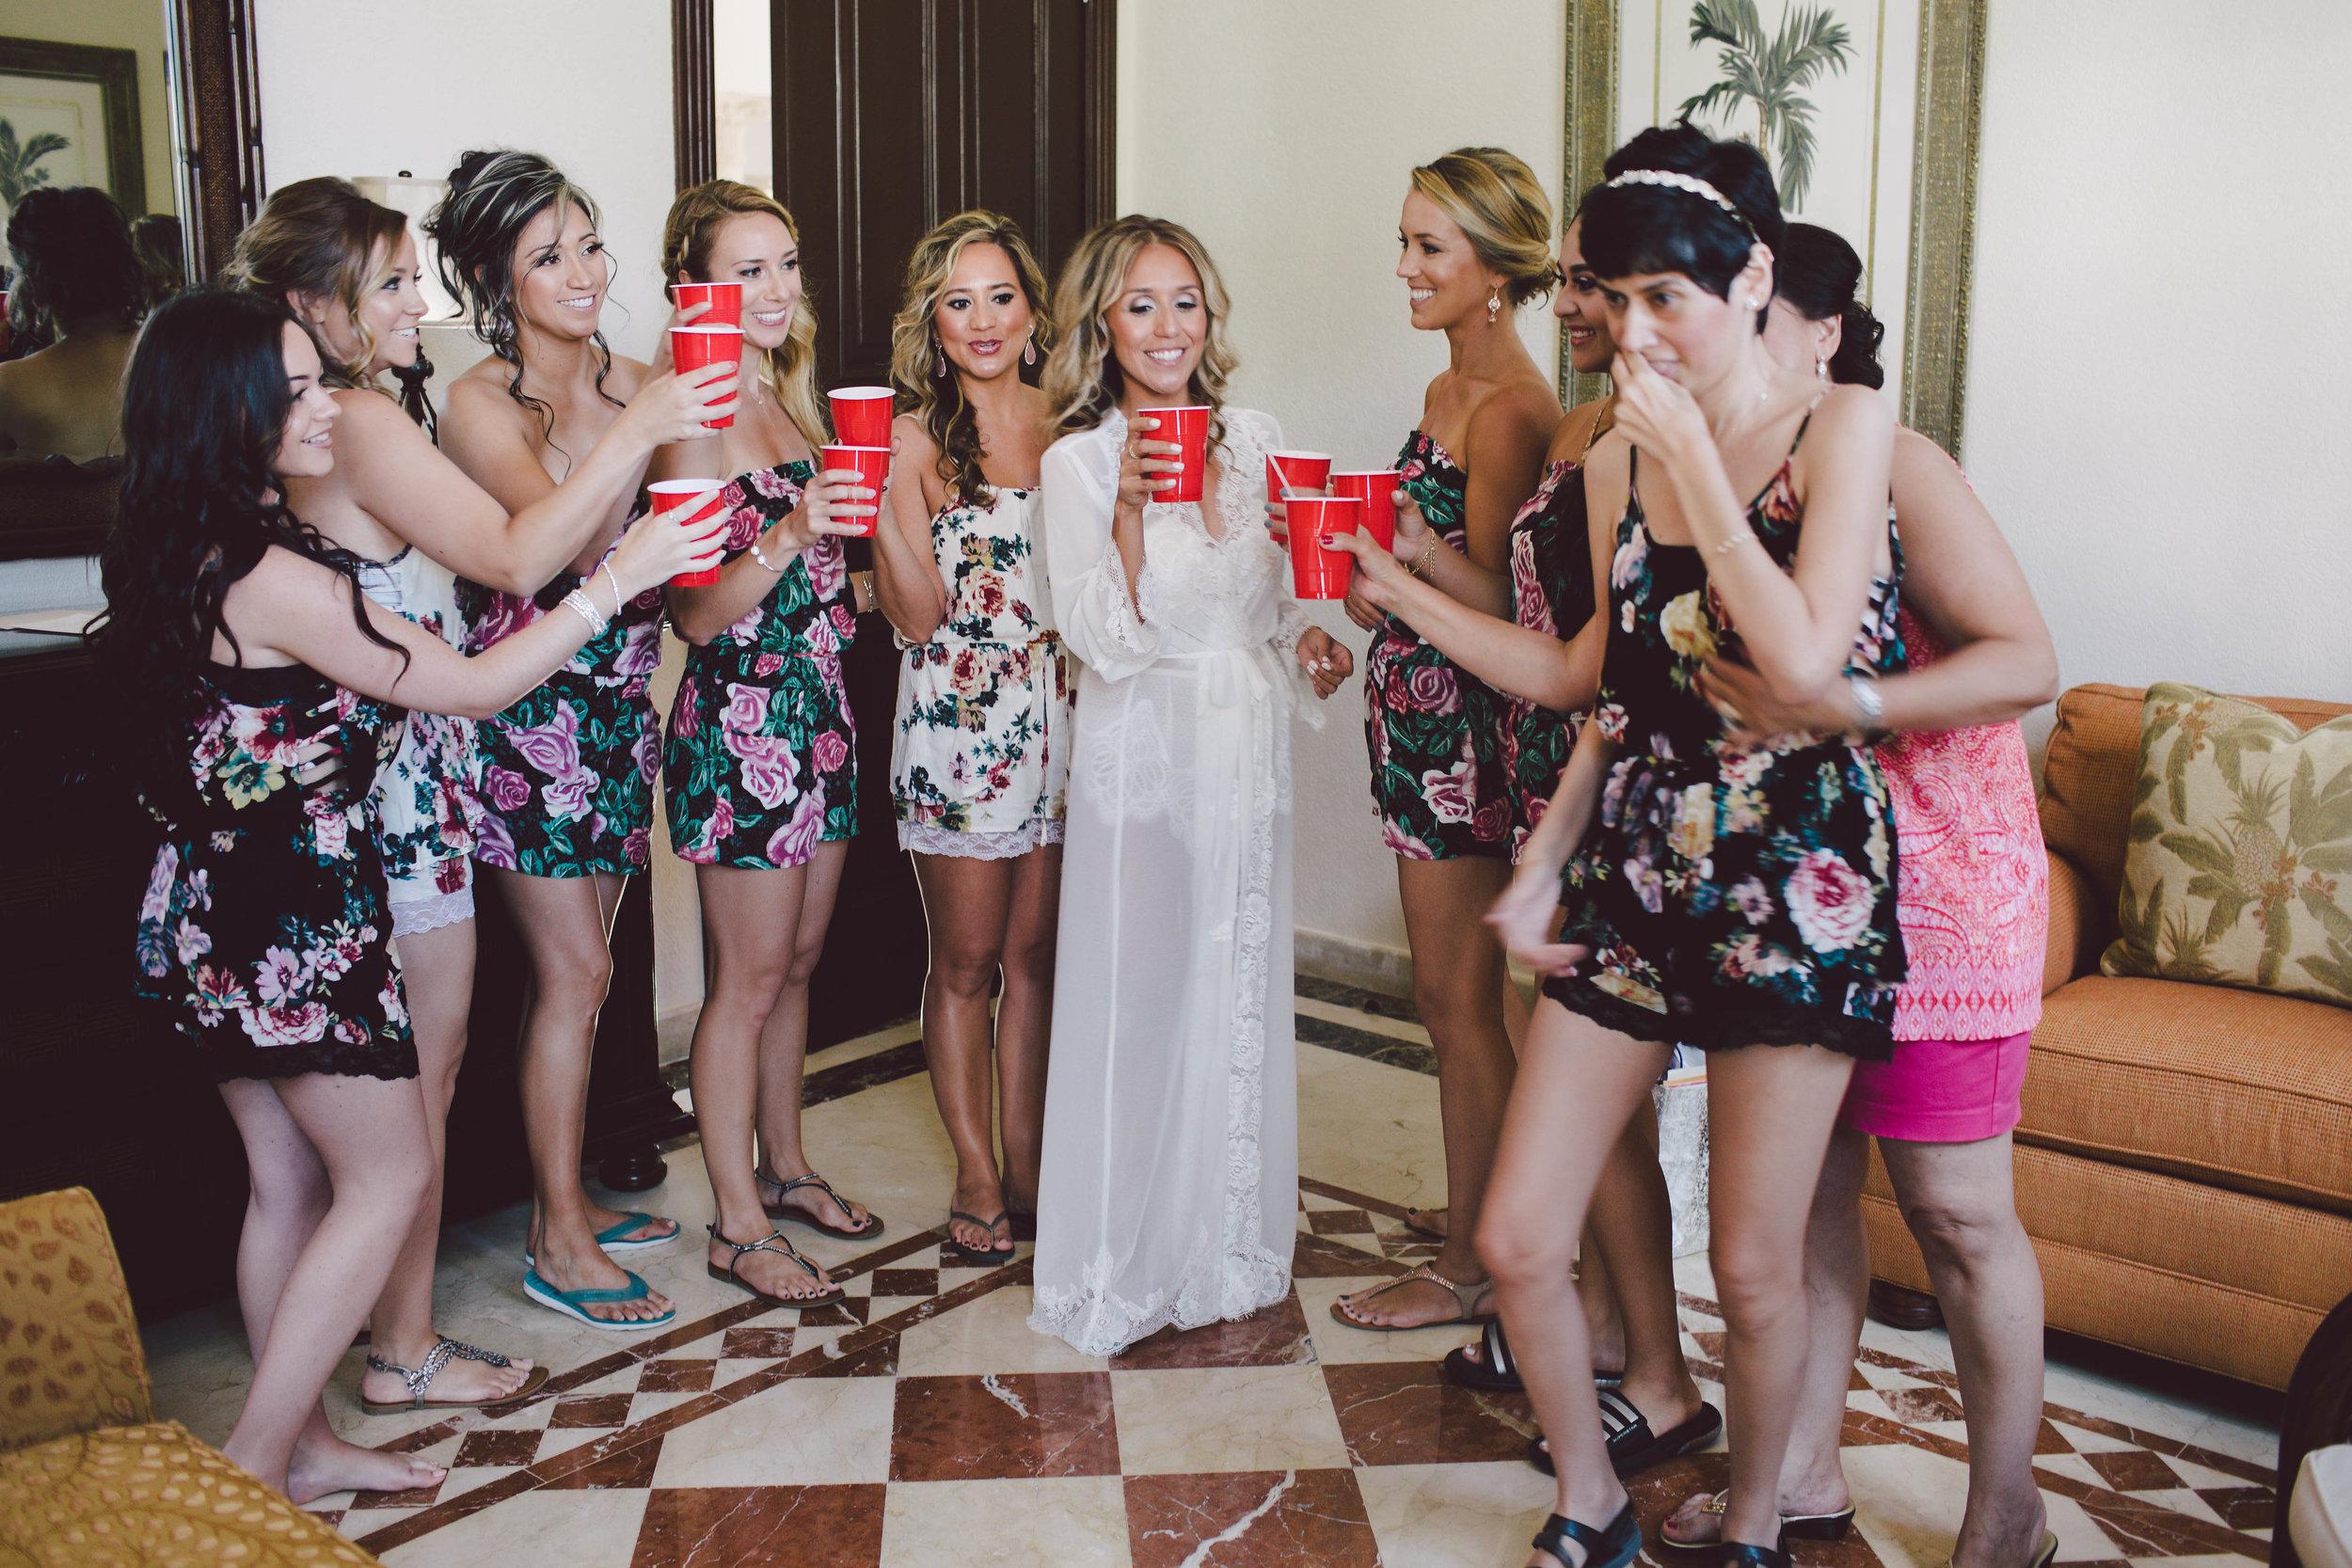 mexico_wedding_cancun_villa_la_joya_evangeline_lane_004.jpg